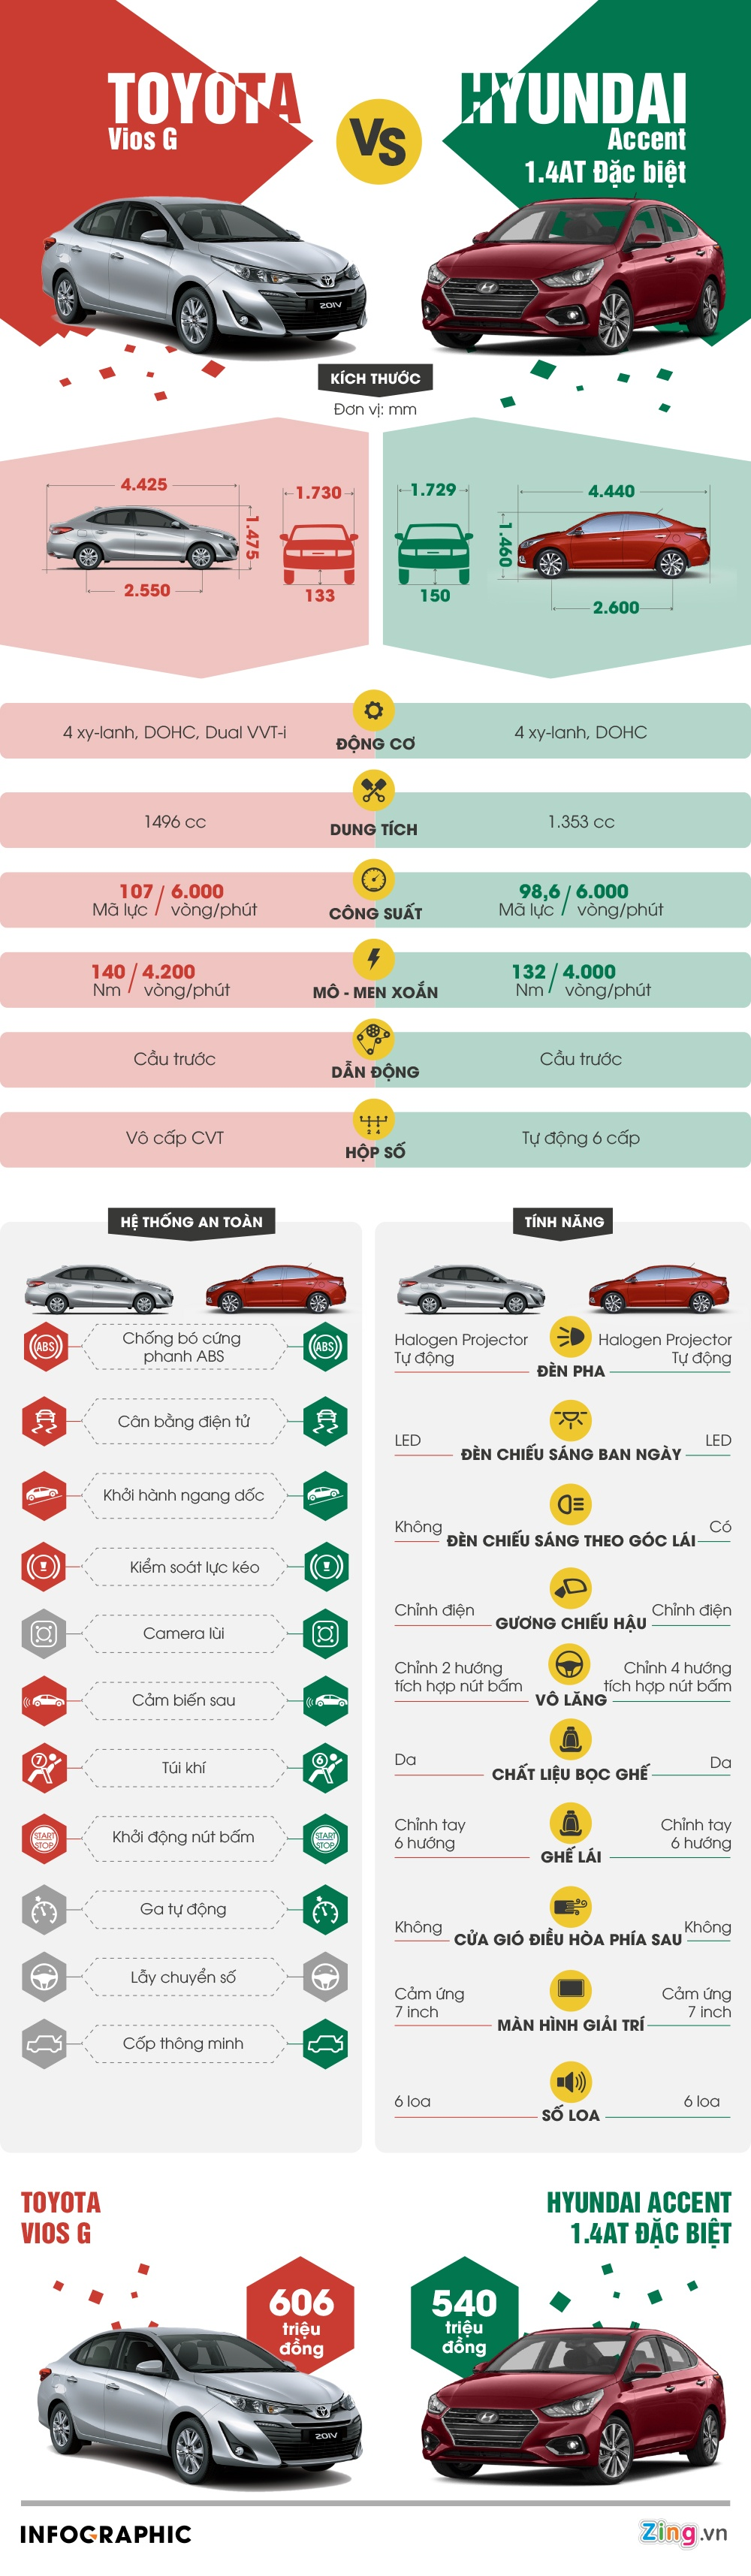 Mua xe gia dinh chon Toyota Vios hay Hyundai Accent? hinh anh 1